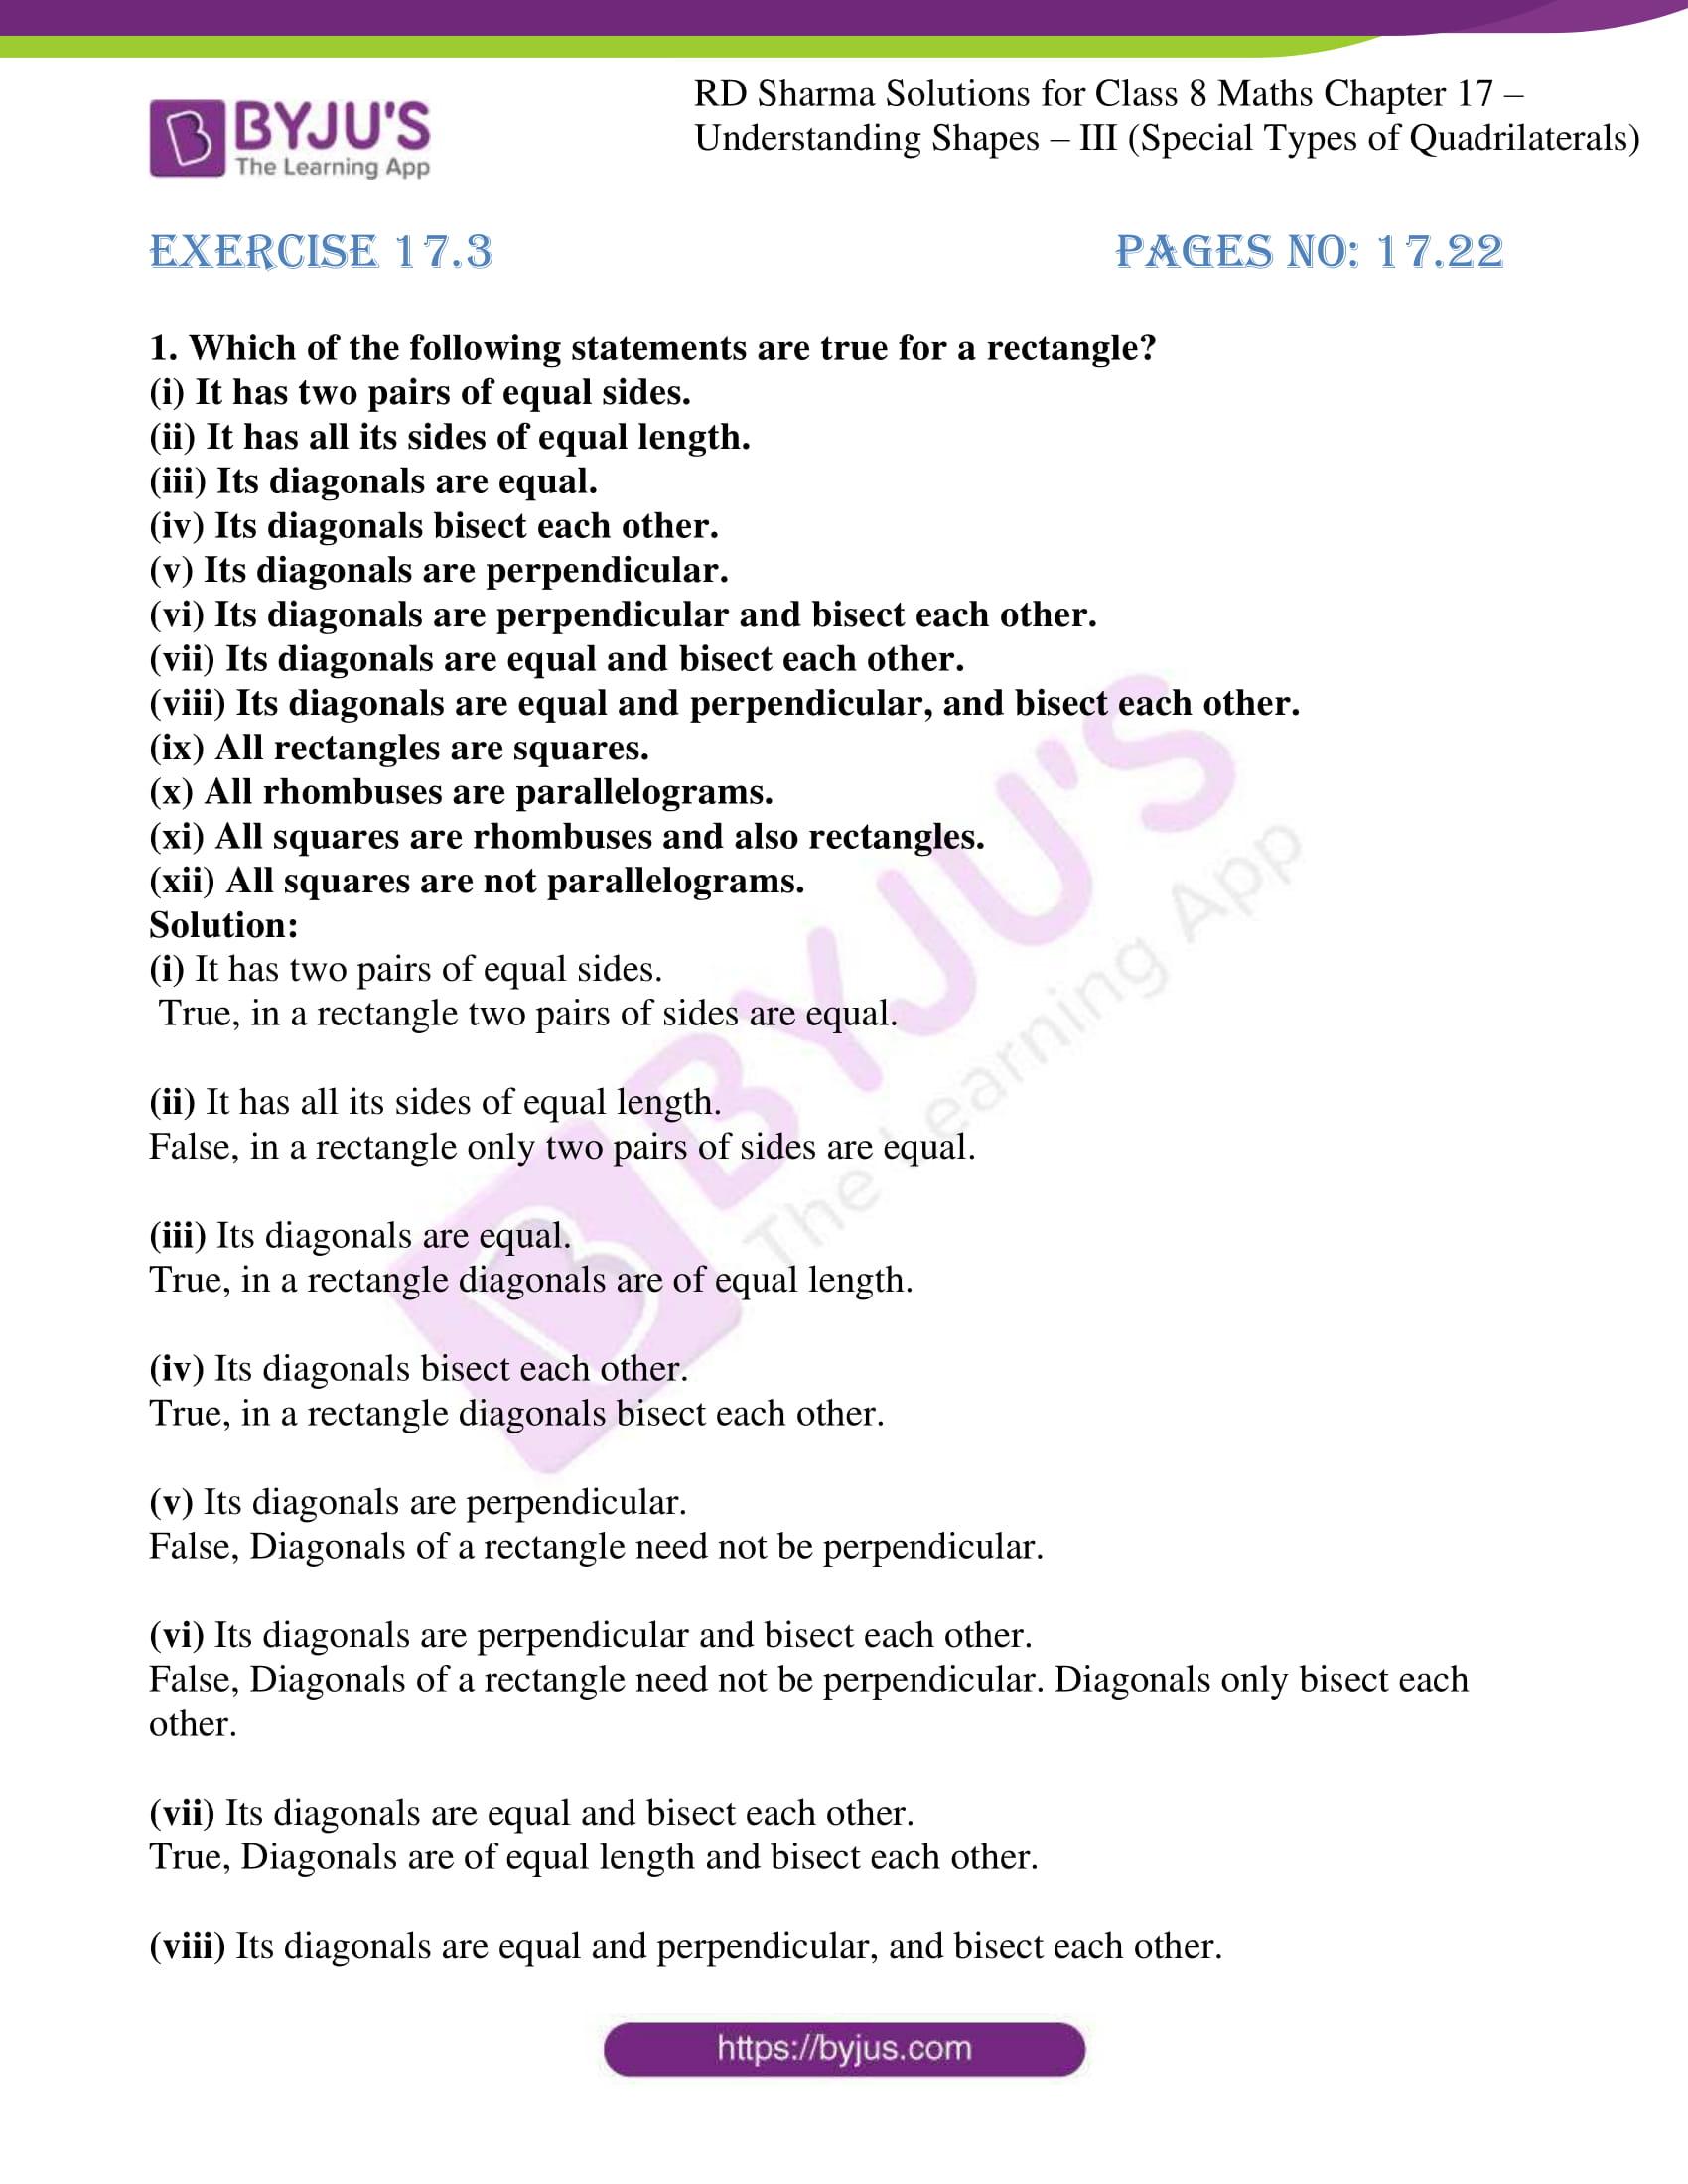 rd sharma class 8 maths chapter 17 exercise 3